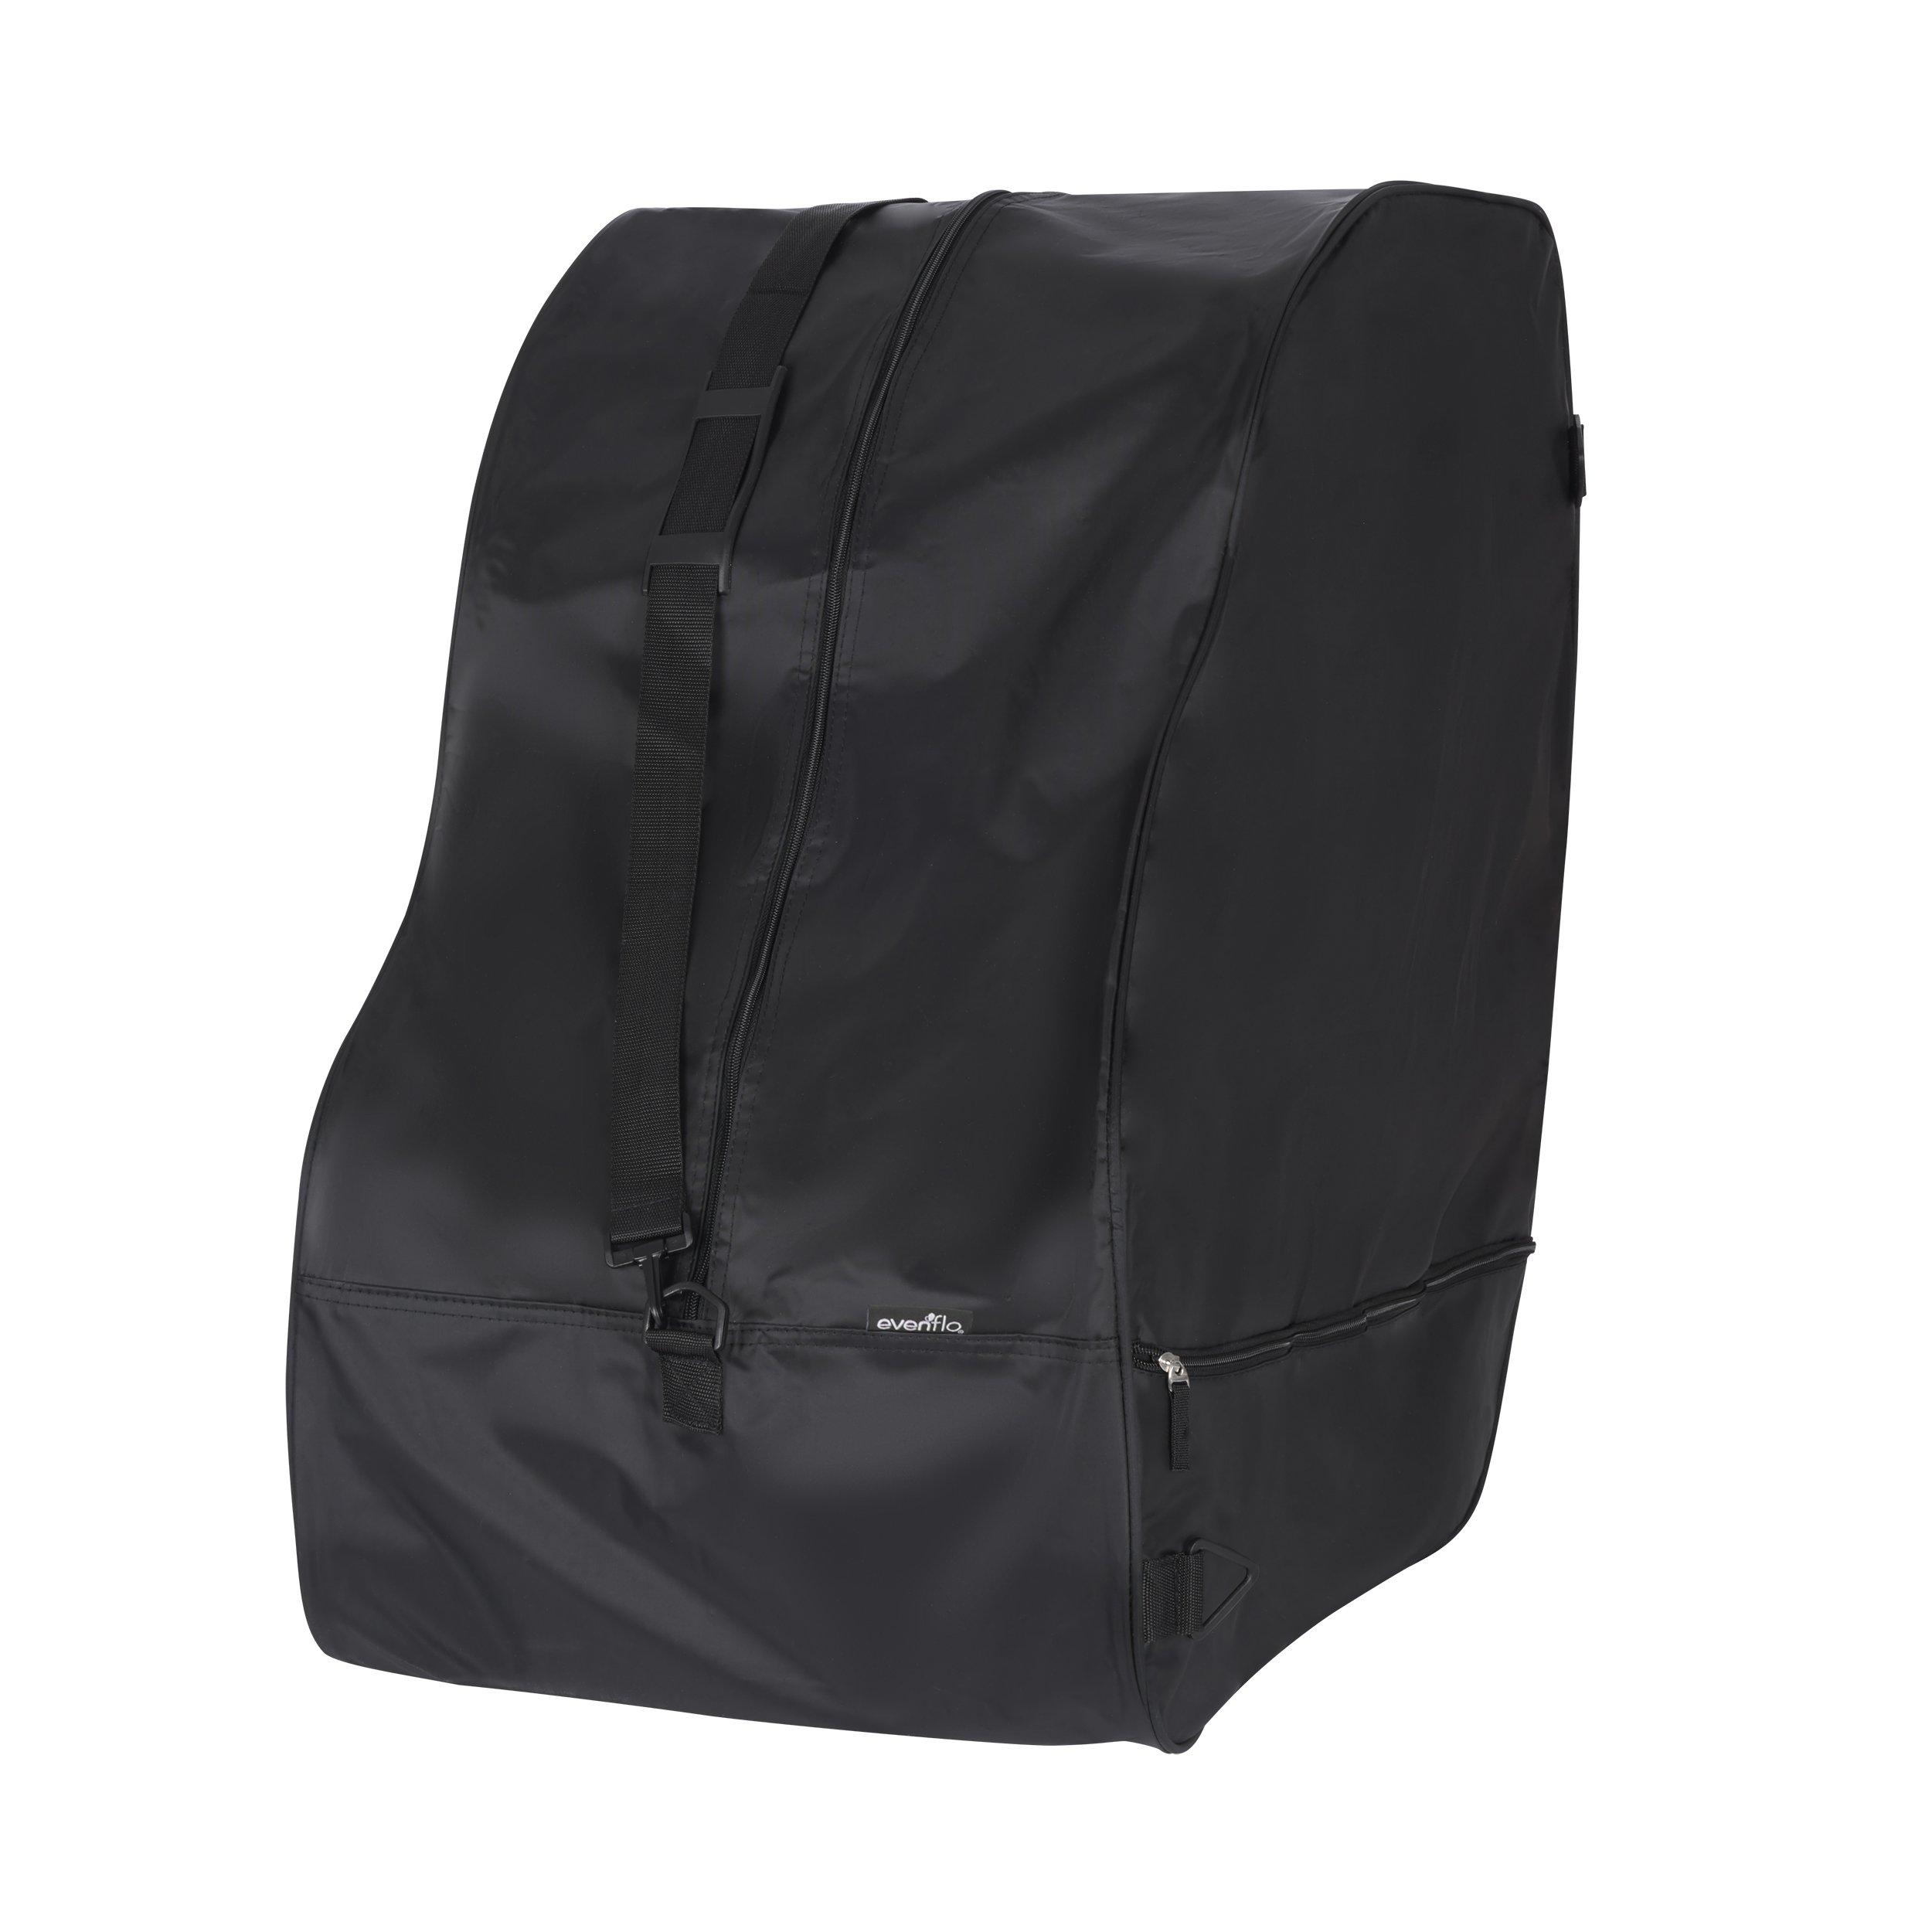 Evenflo Car Seat Travel & Storage Bag by Evenflo